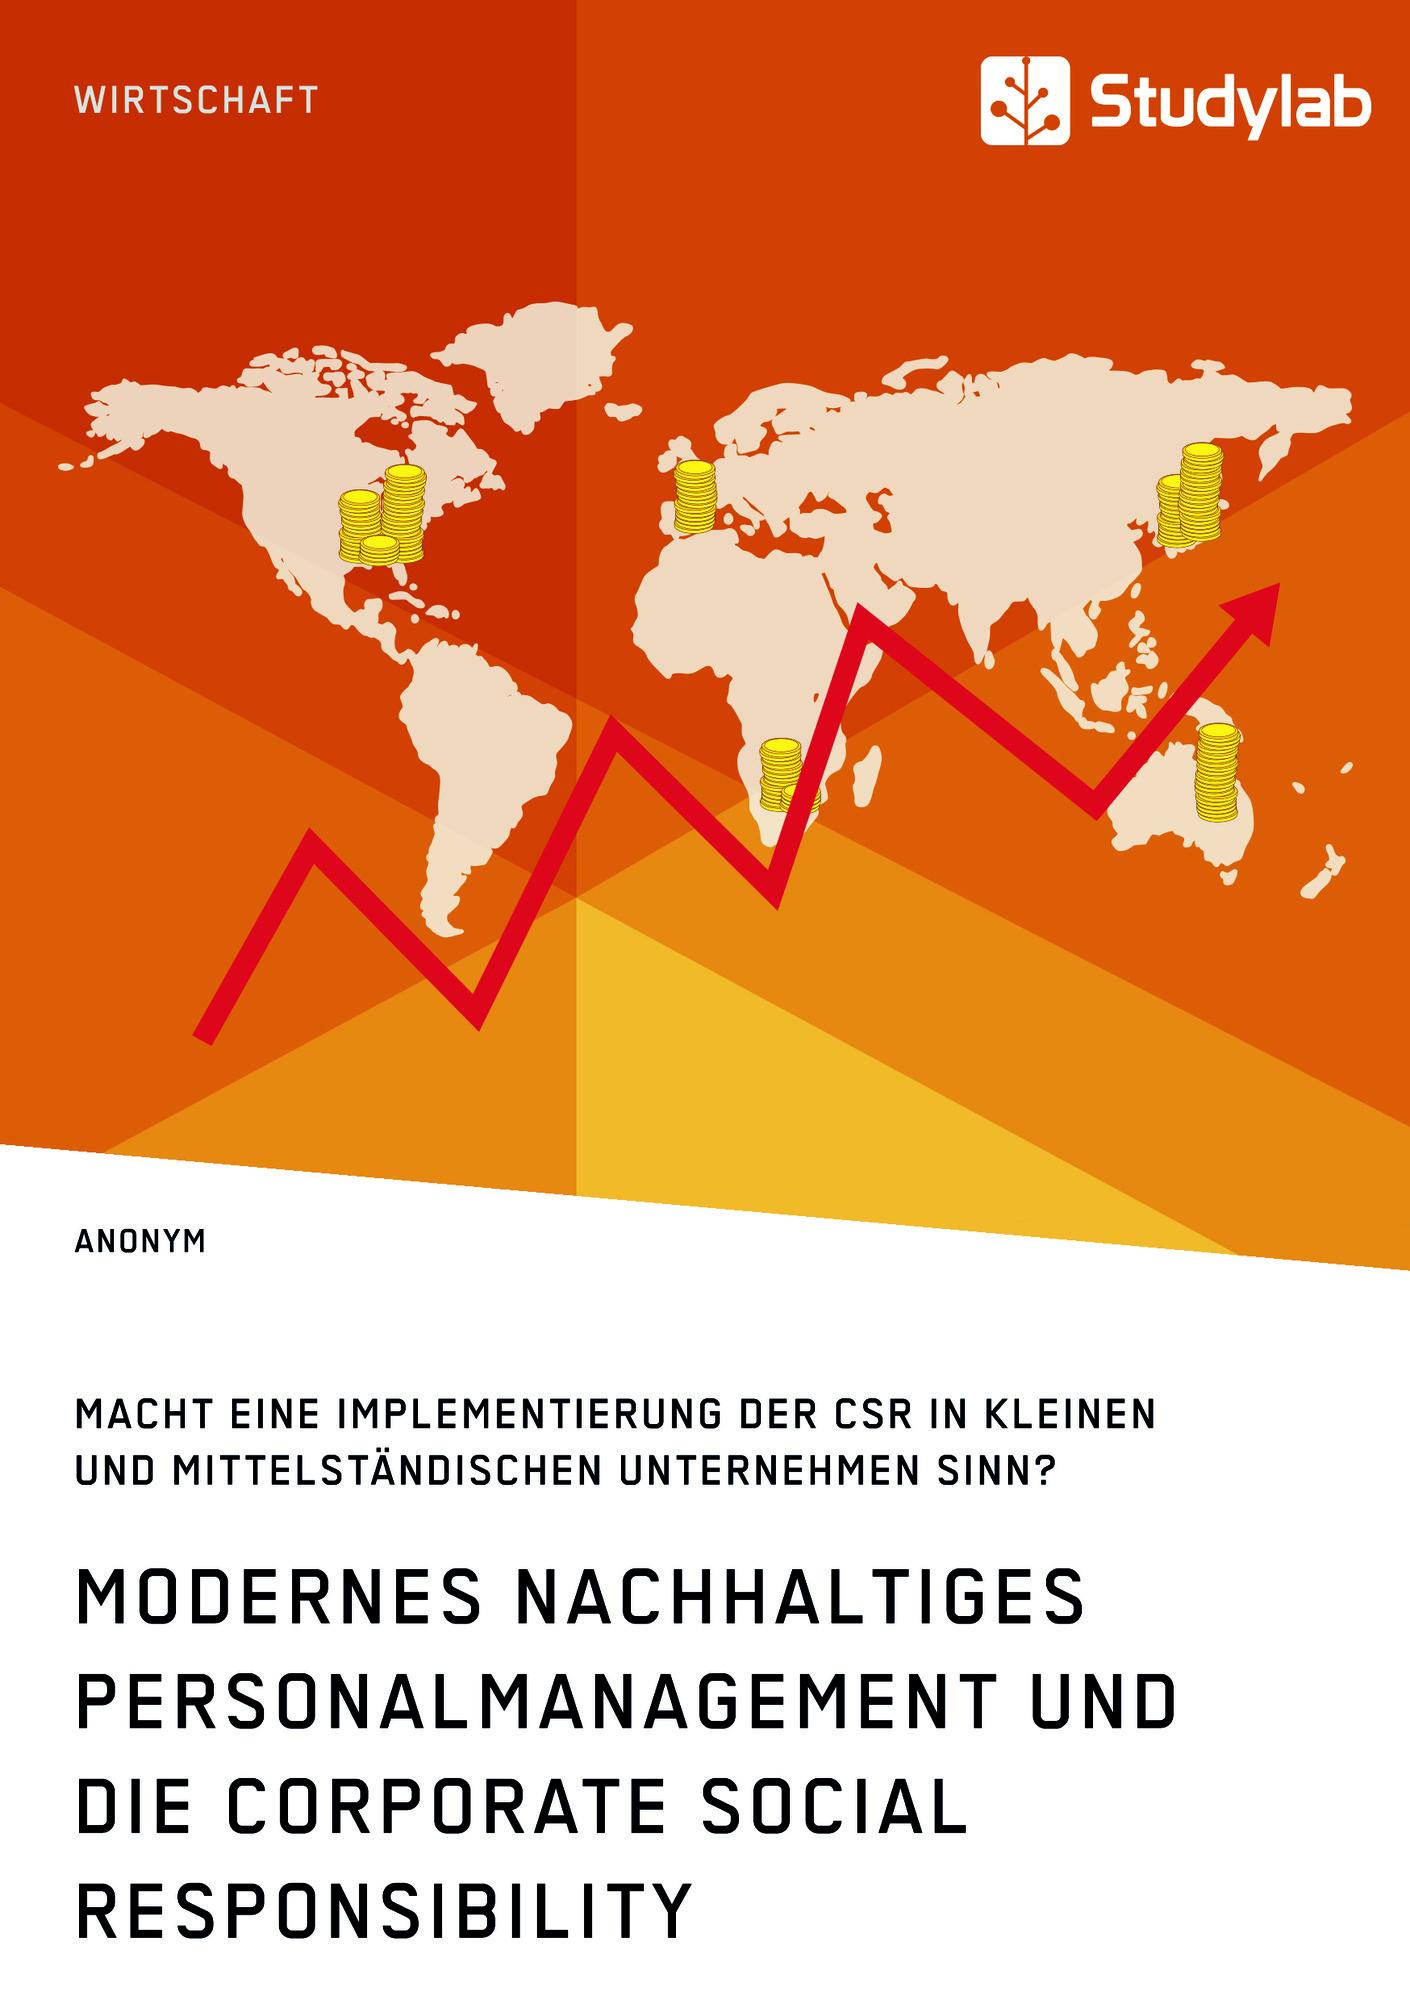 Titel: Modernes nachhaltiges Personalmanagement und die Corporate Social Responsibility